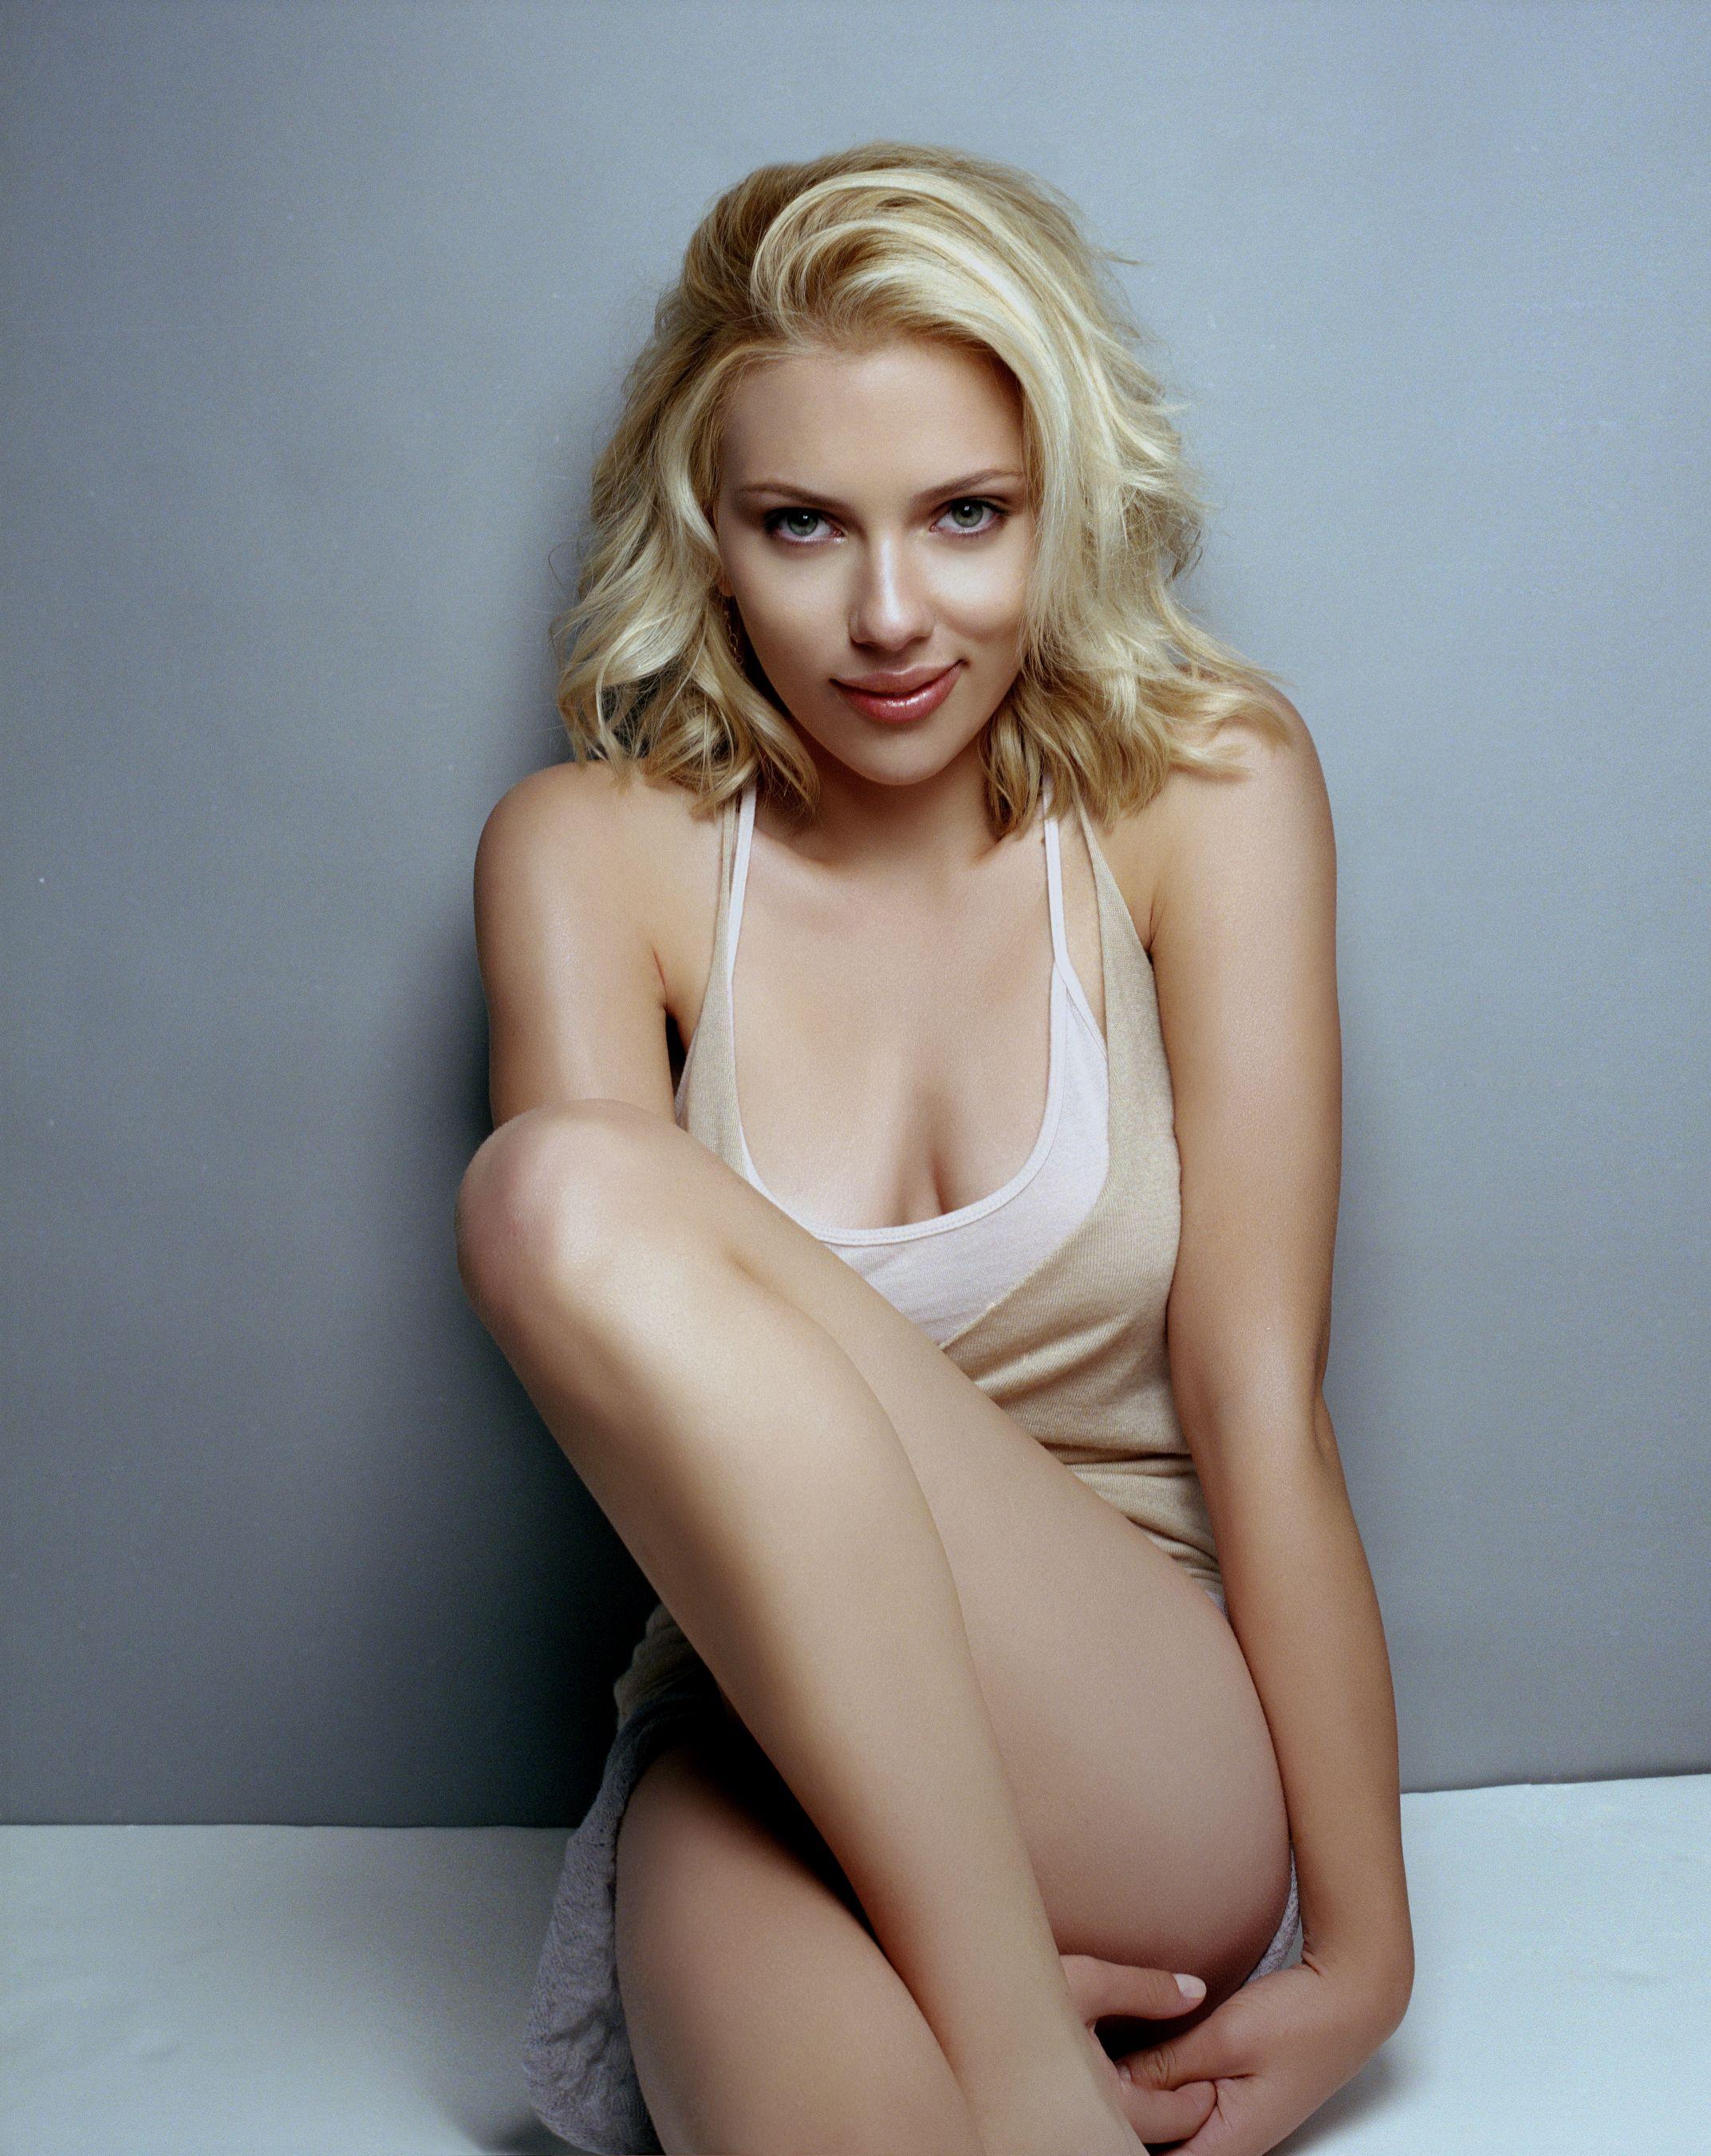 Scarlett johansson maxim nudes pics